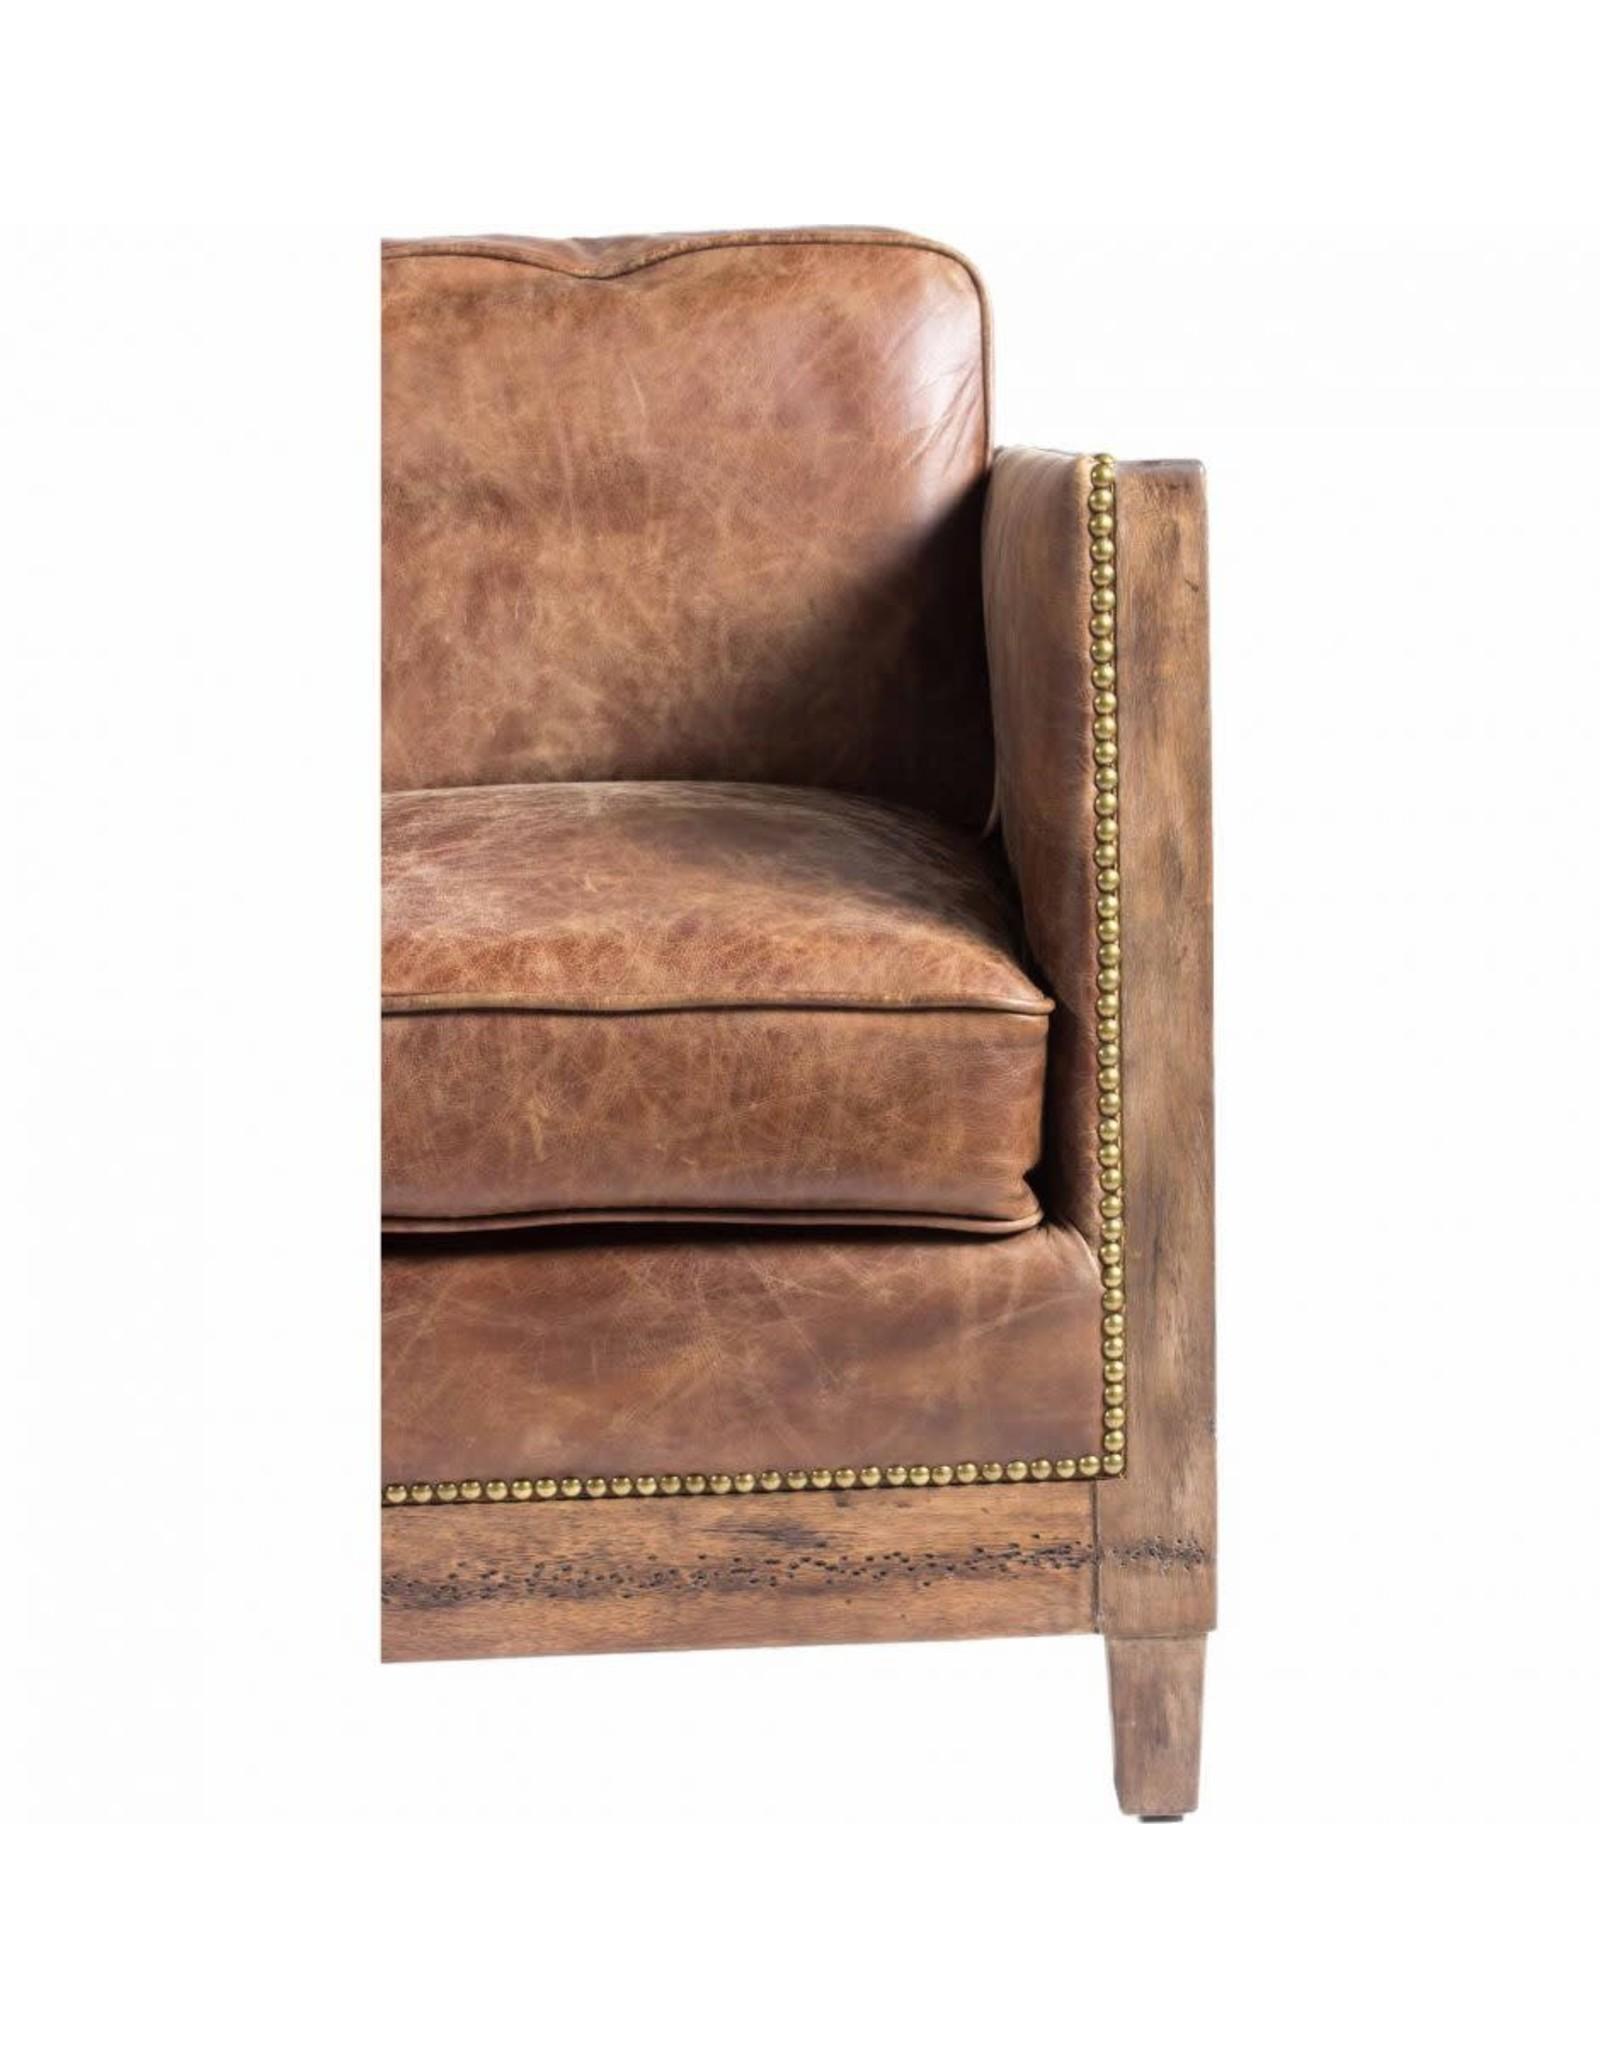 Moe's Home Collection Darlington Sofa